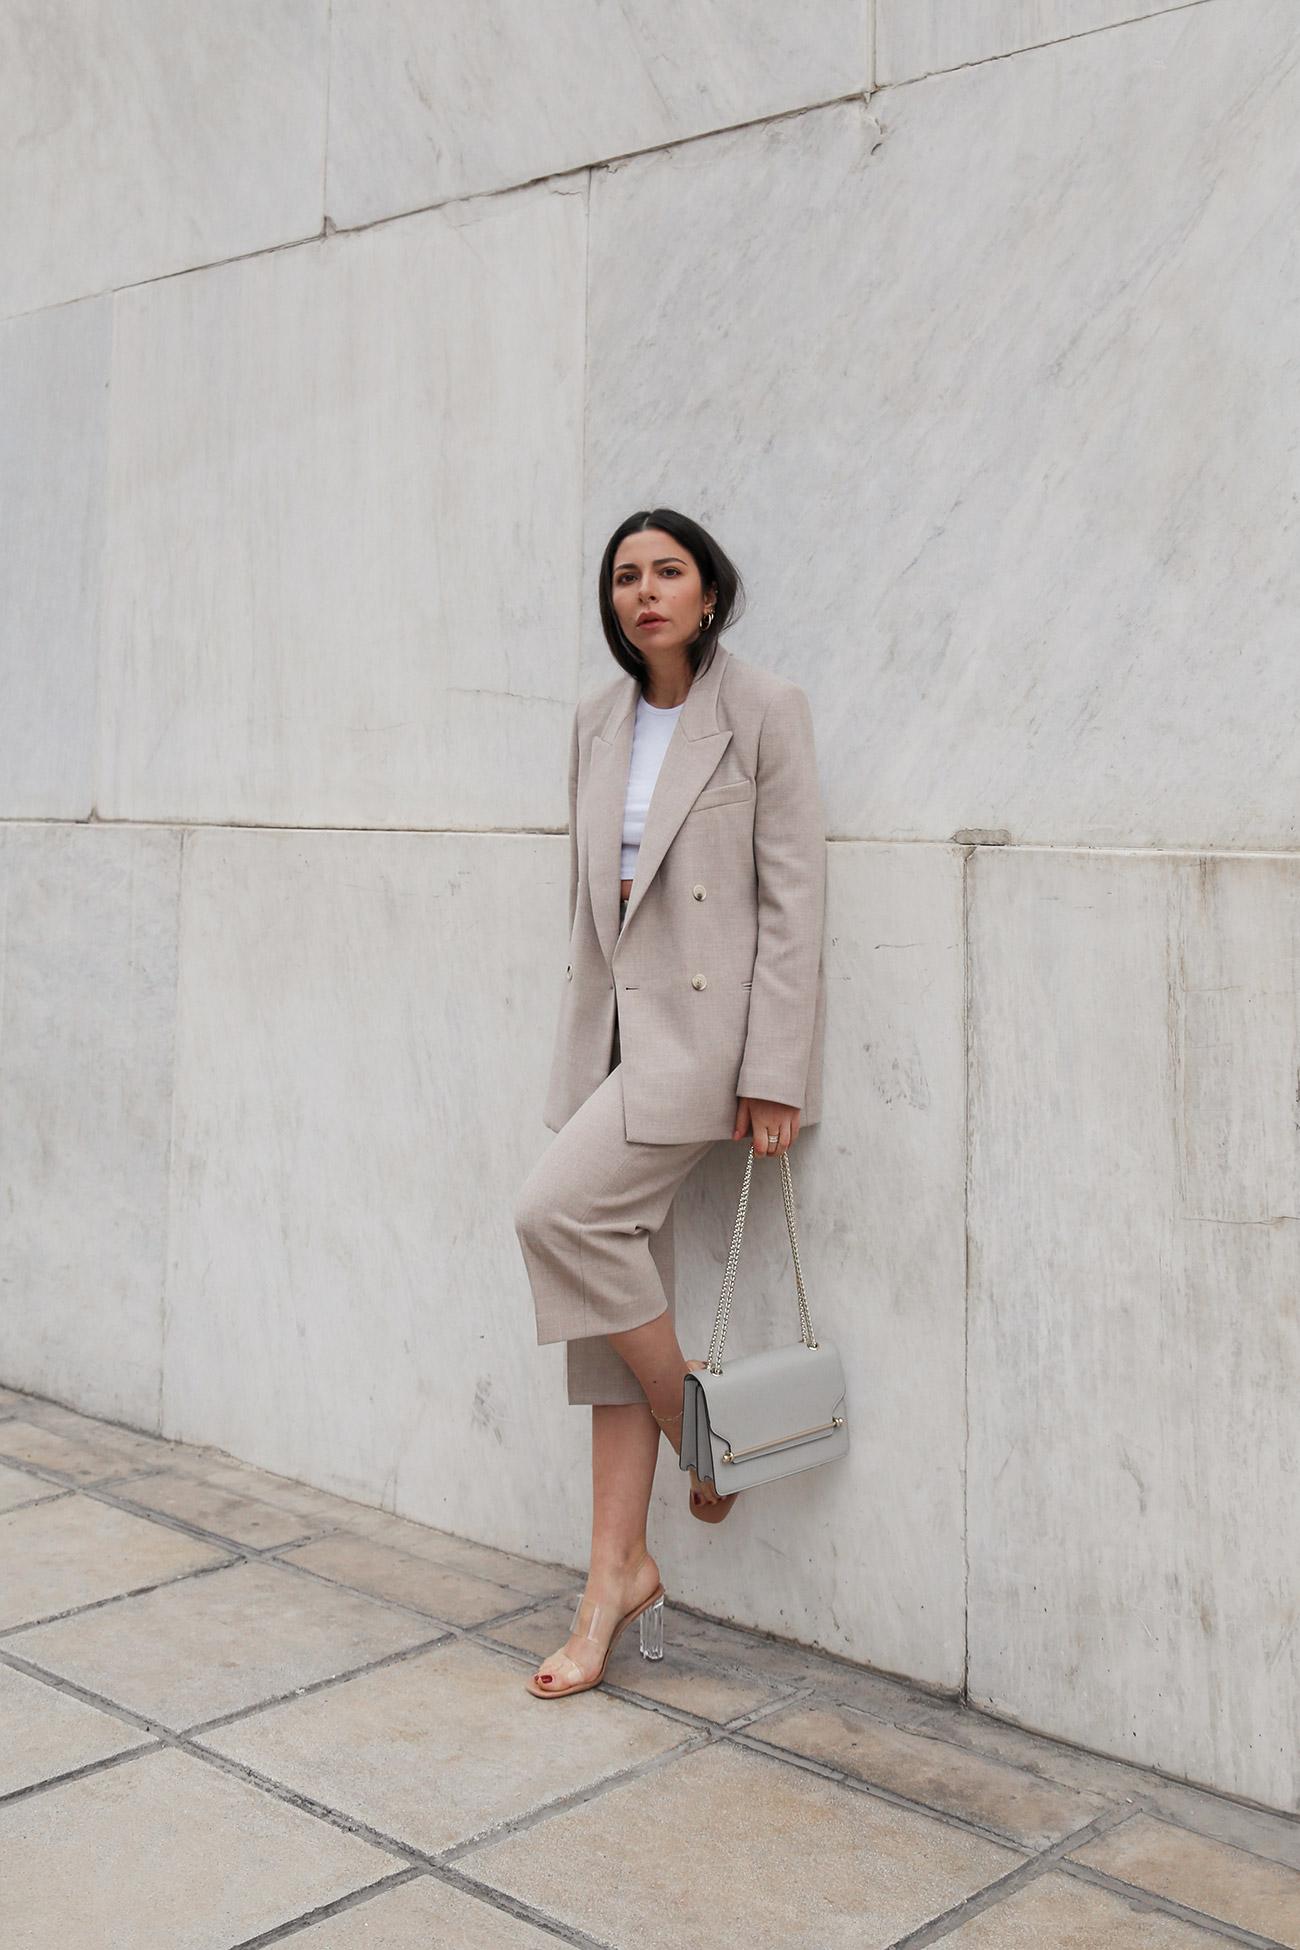 Stella Asteria wearing a beige Bermuda suit